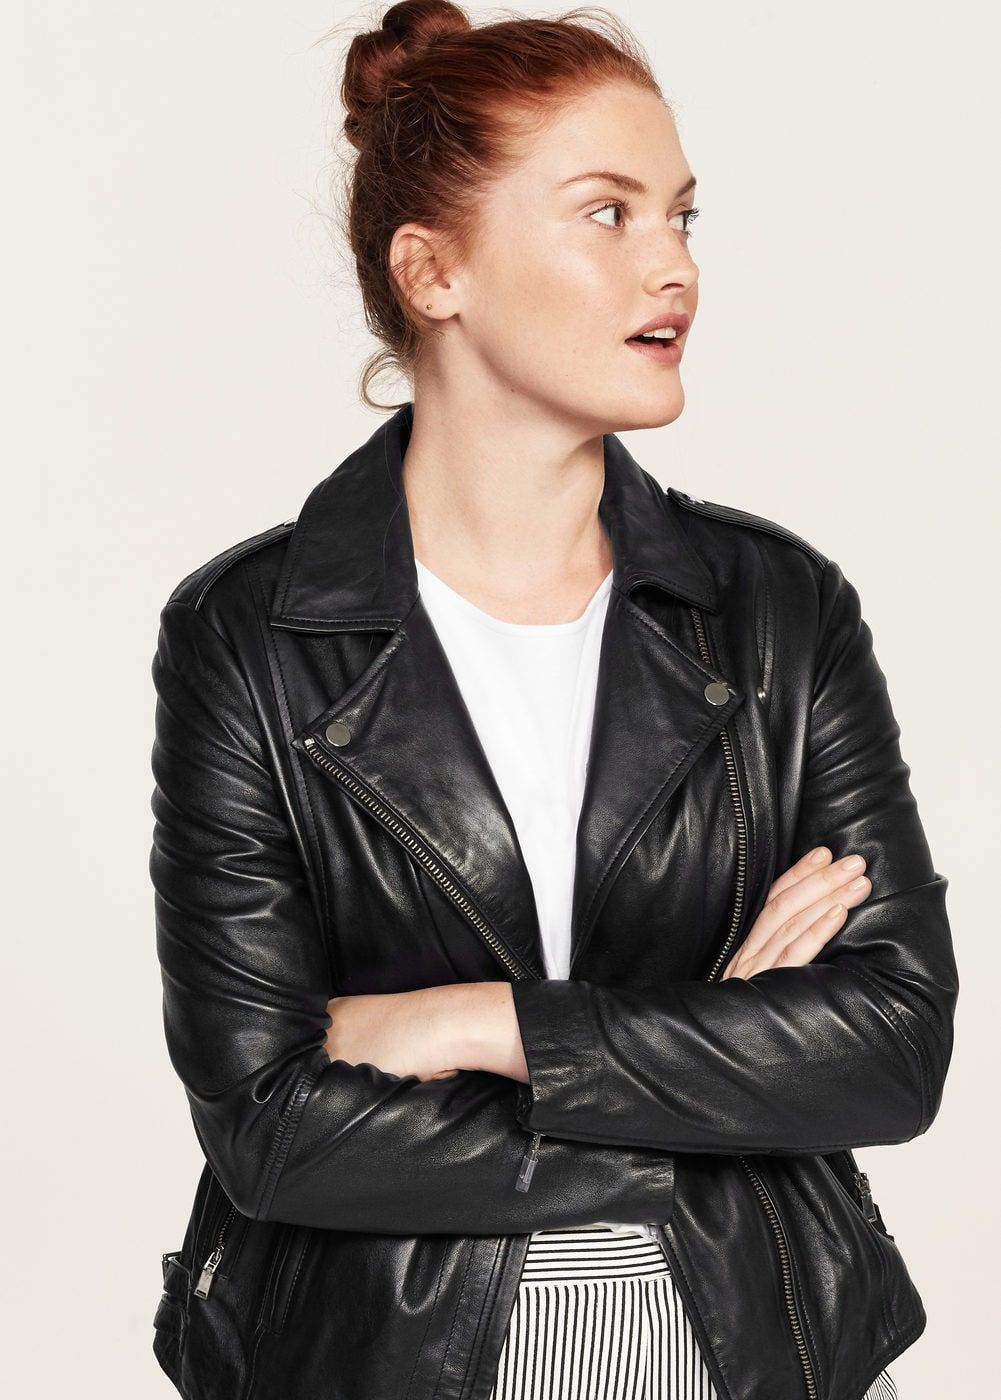 Cazadora Biker Piel Tallas Grandes Violeta By Mango Espana Leather Jacket Girl Womens Biker Jacket New Orleans Fashion